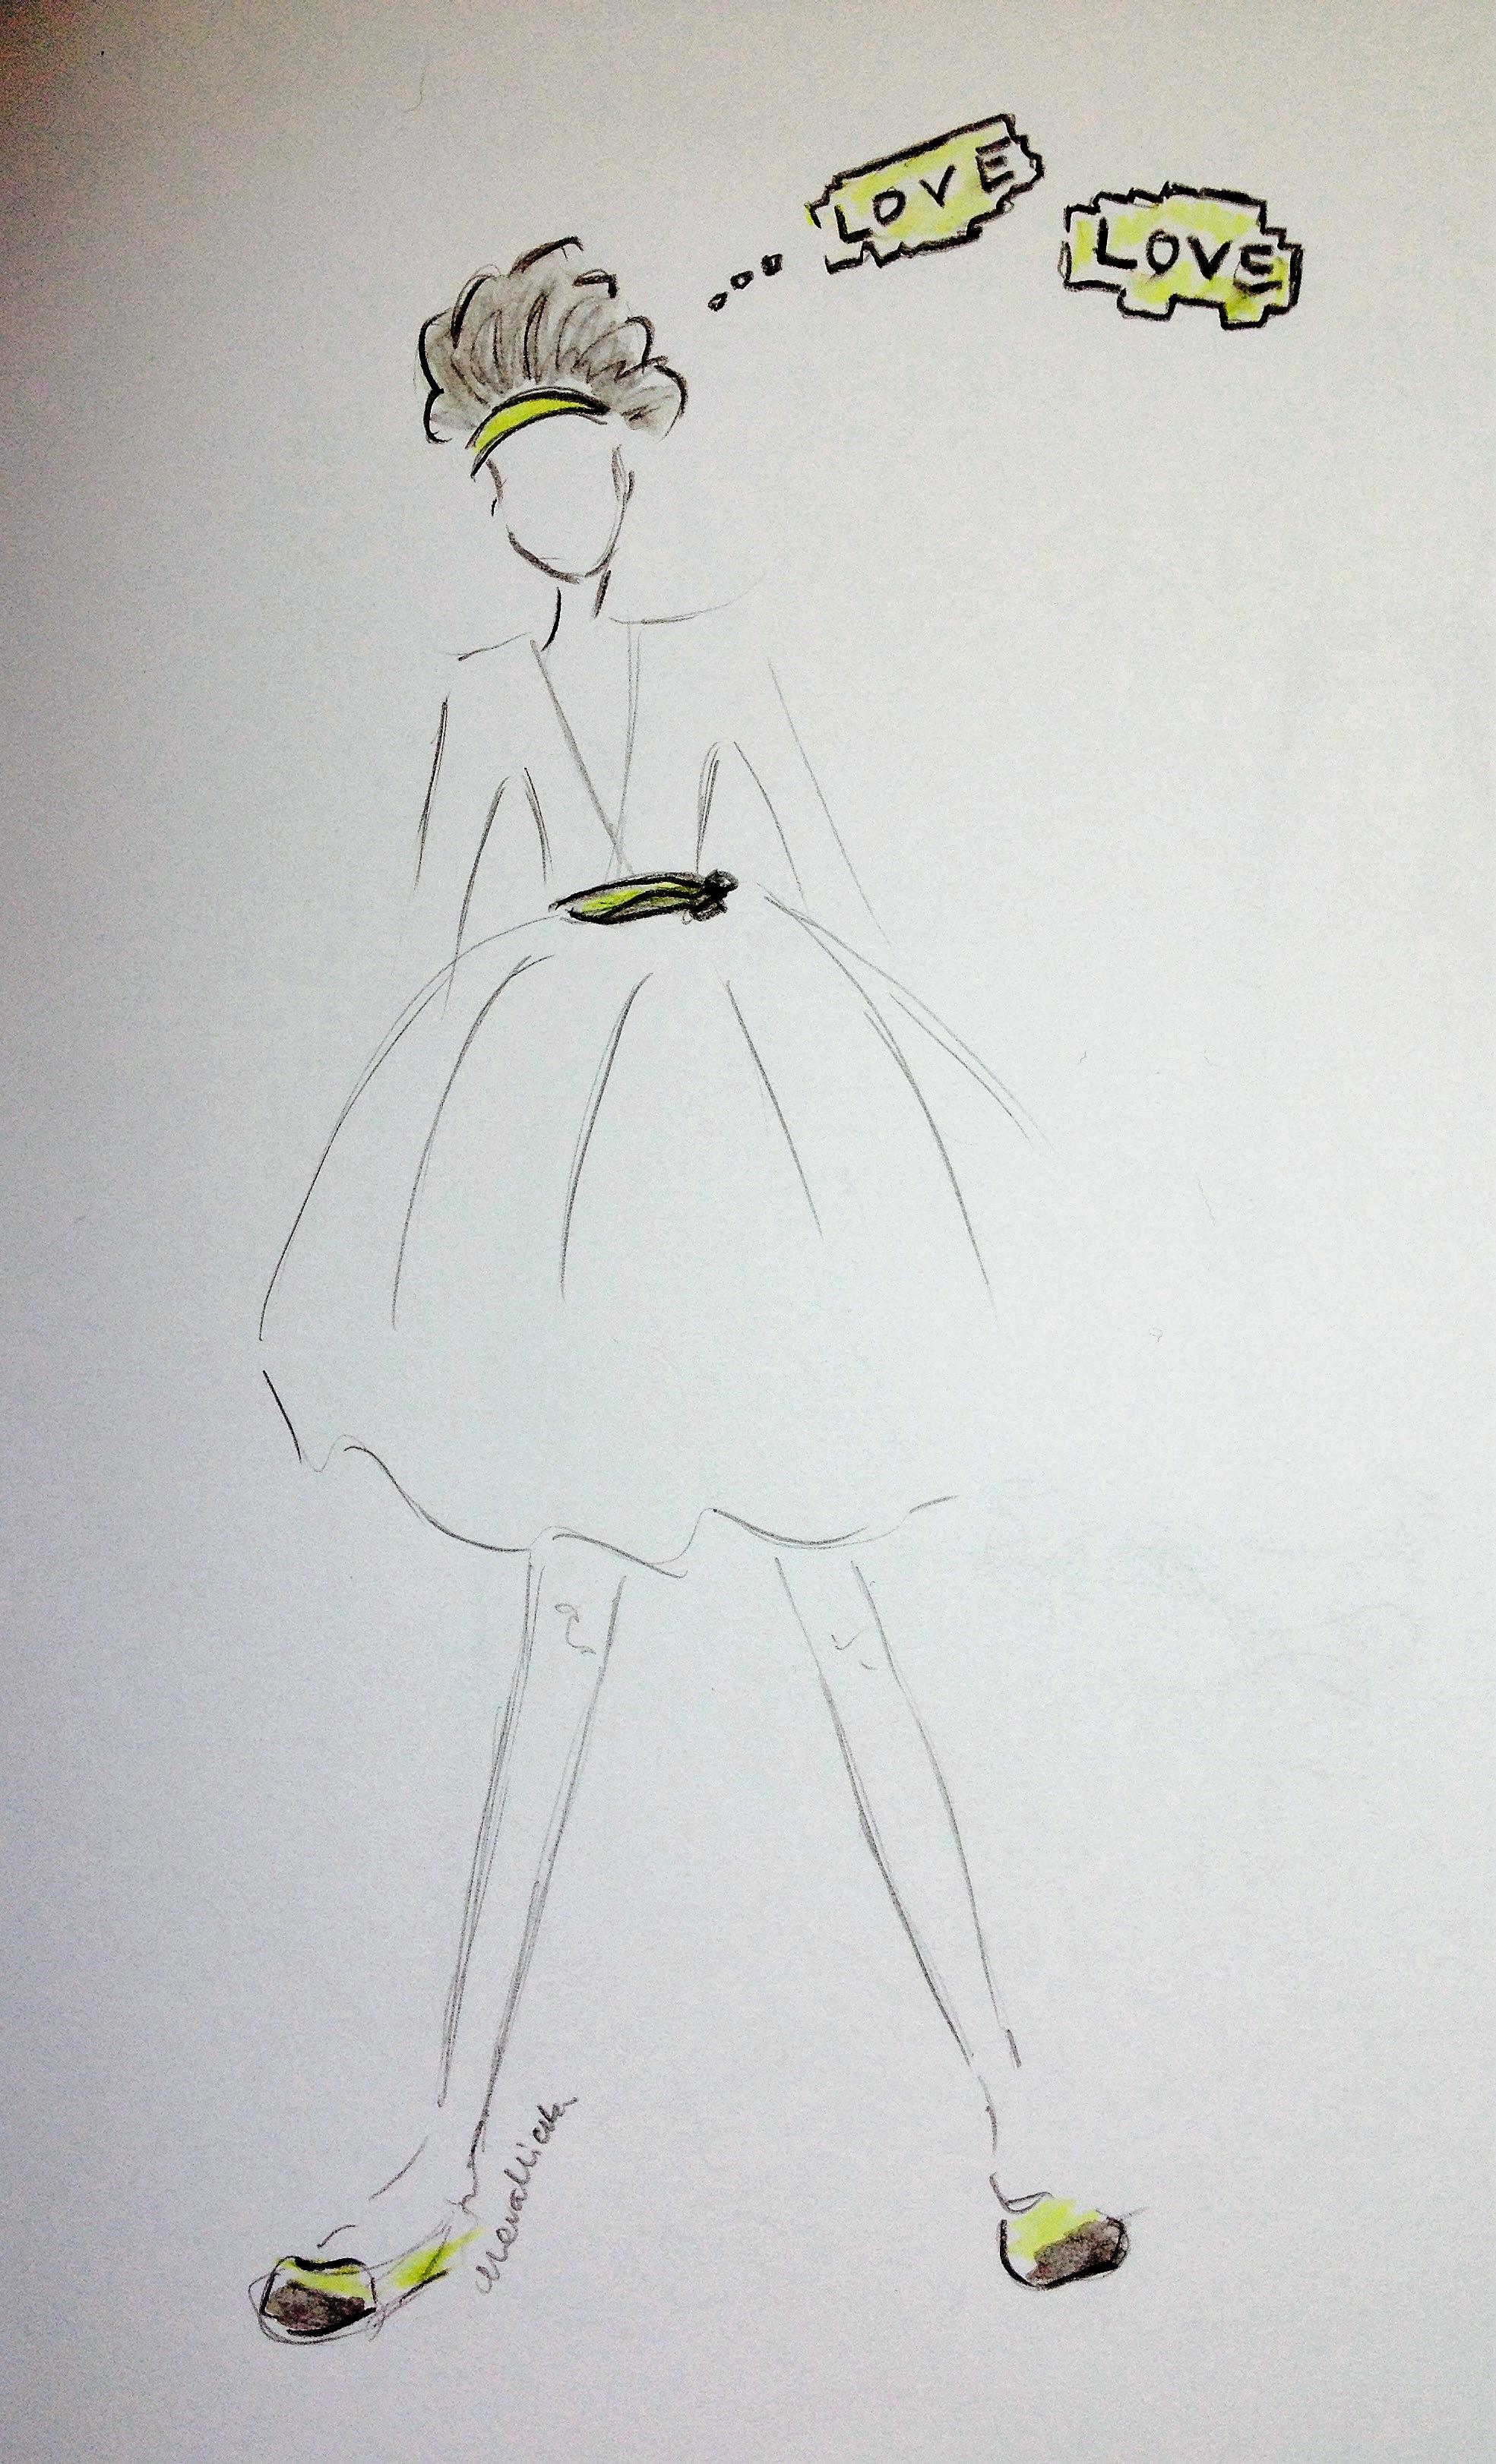 image1 - Copie.JPG